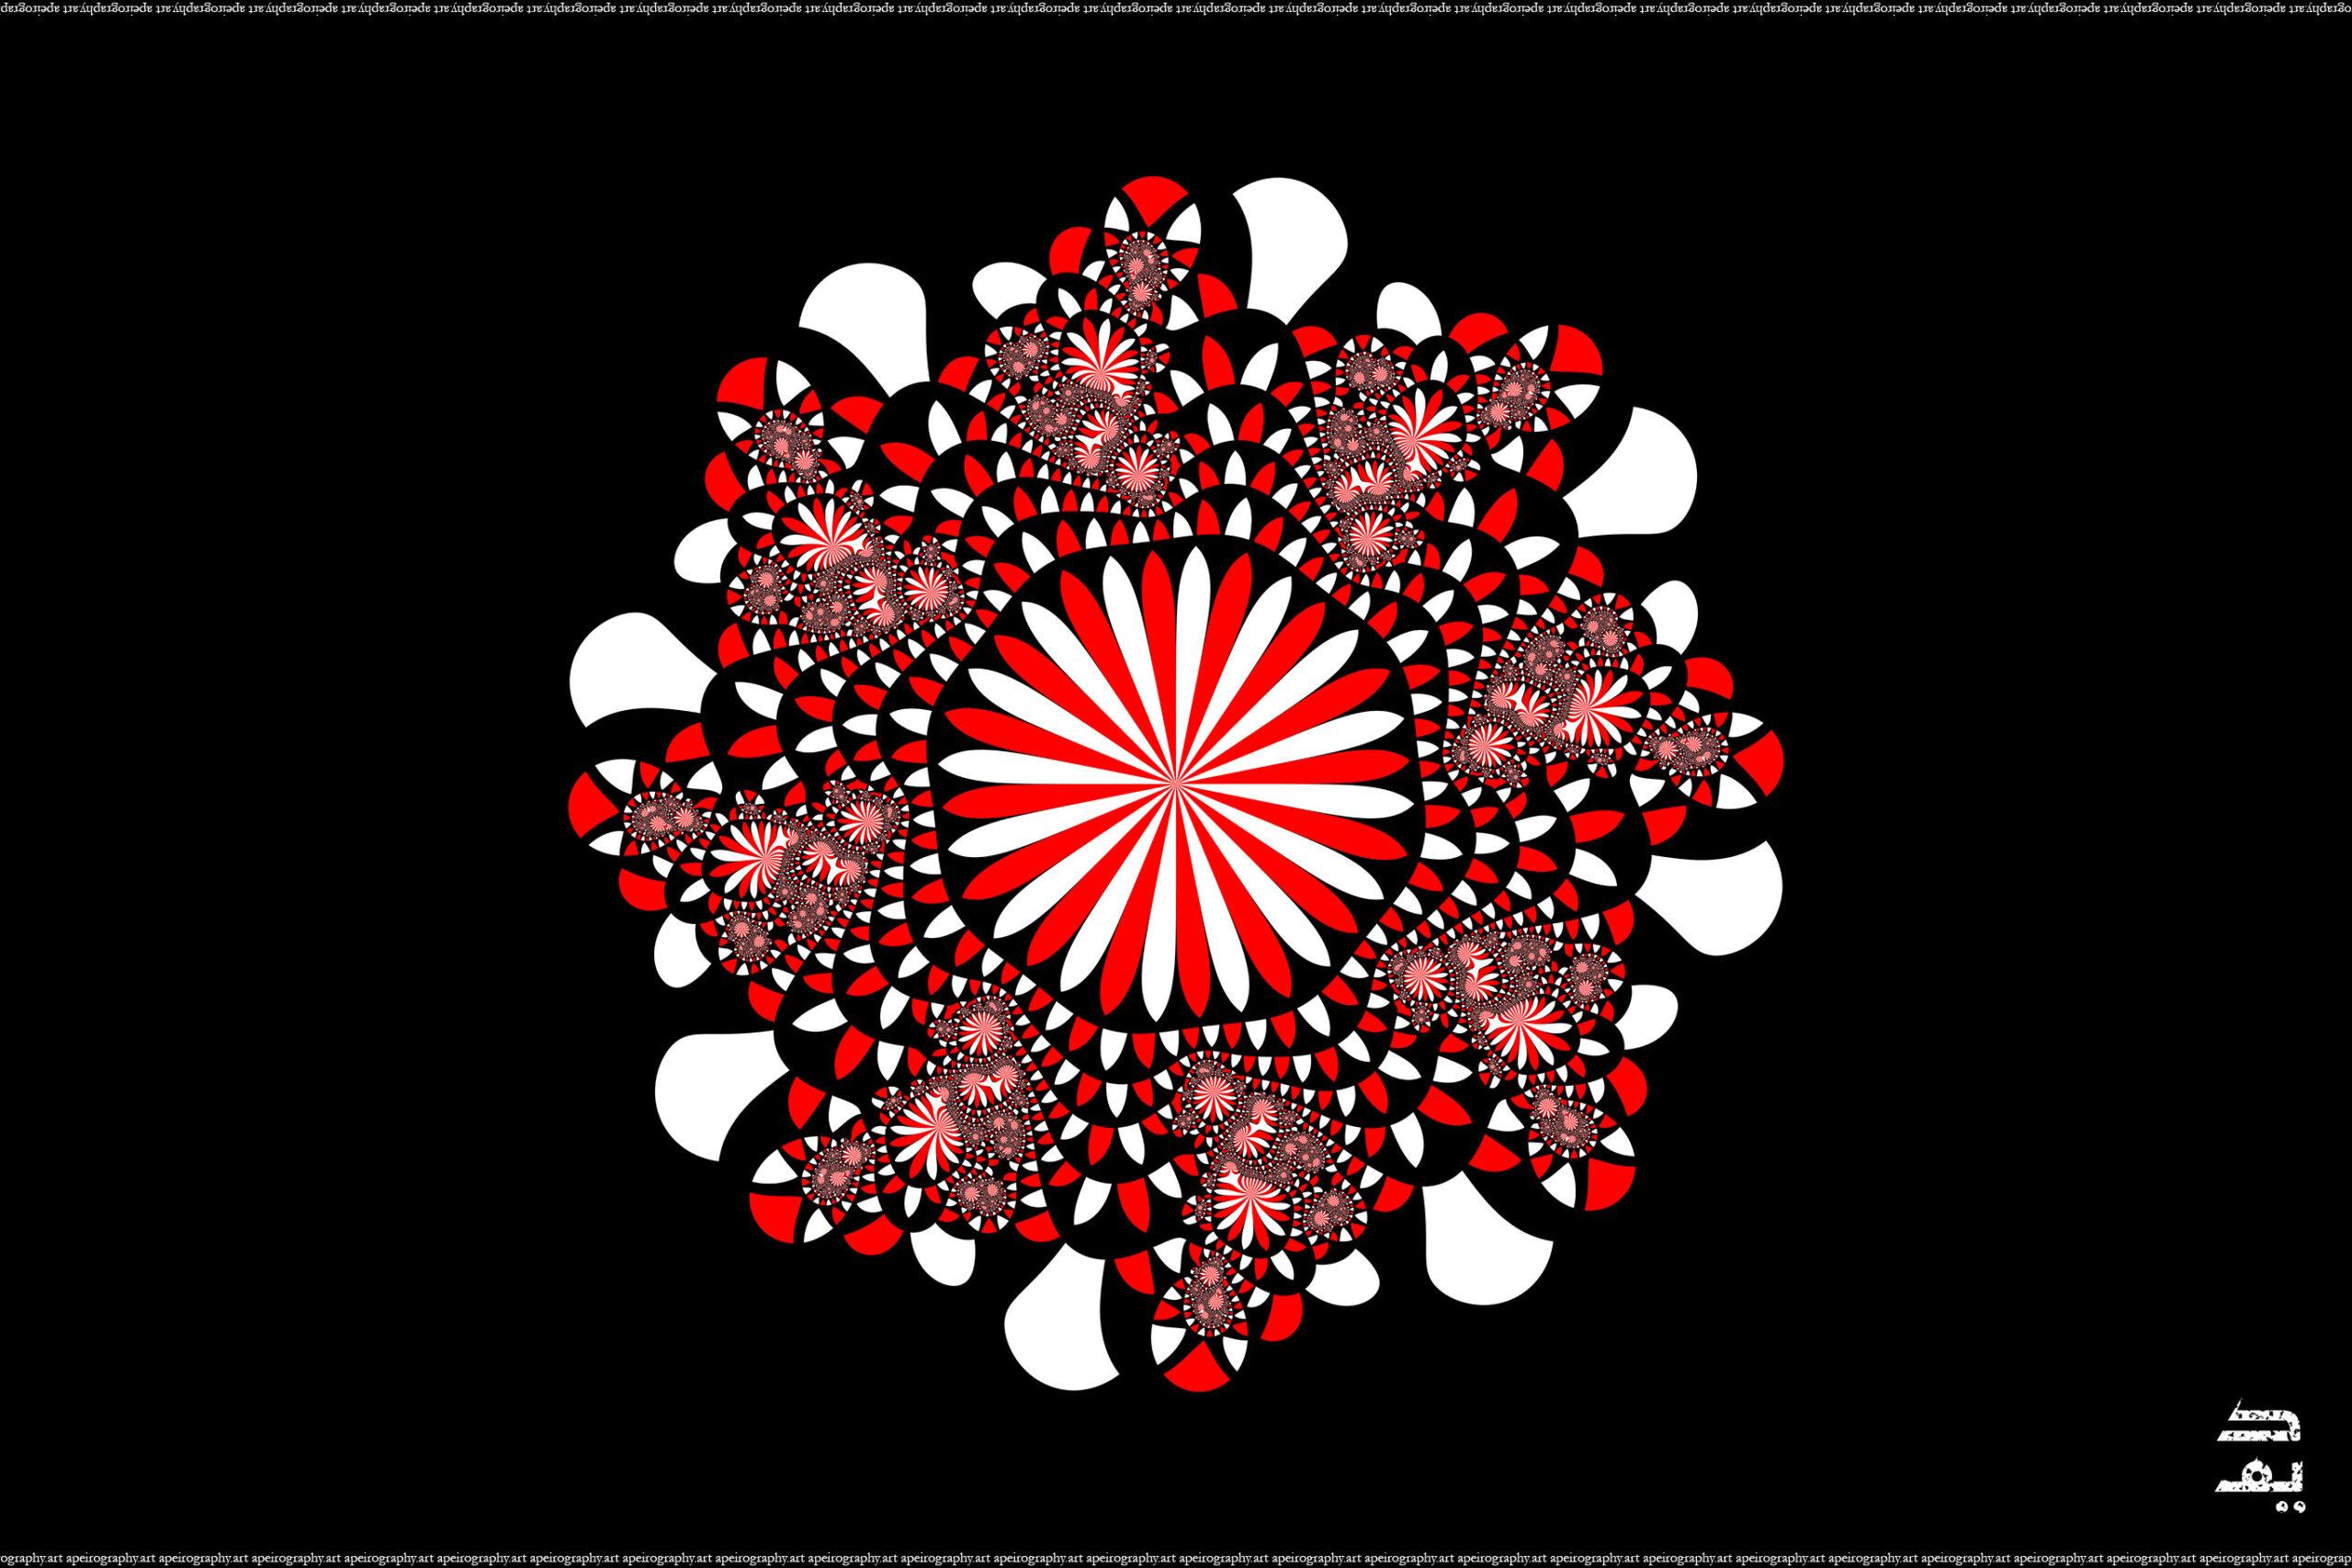 Apeirography_003_-_Chrysanthemum_Canadensis